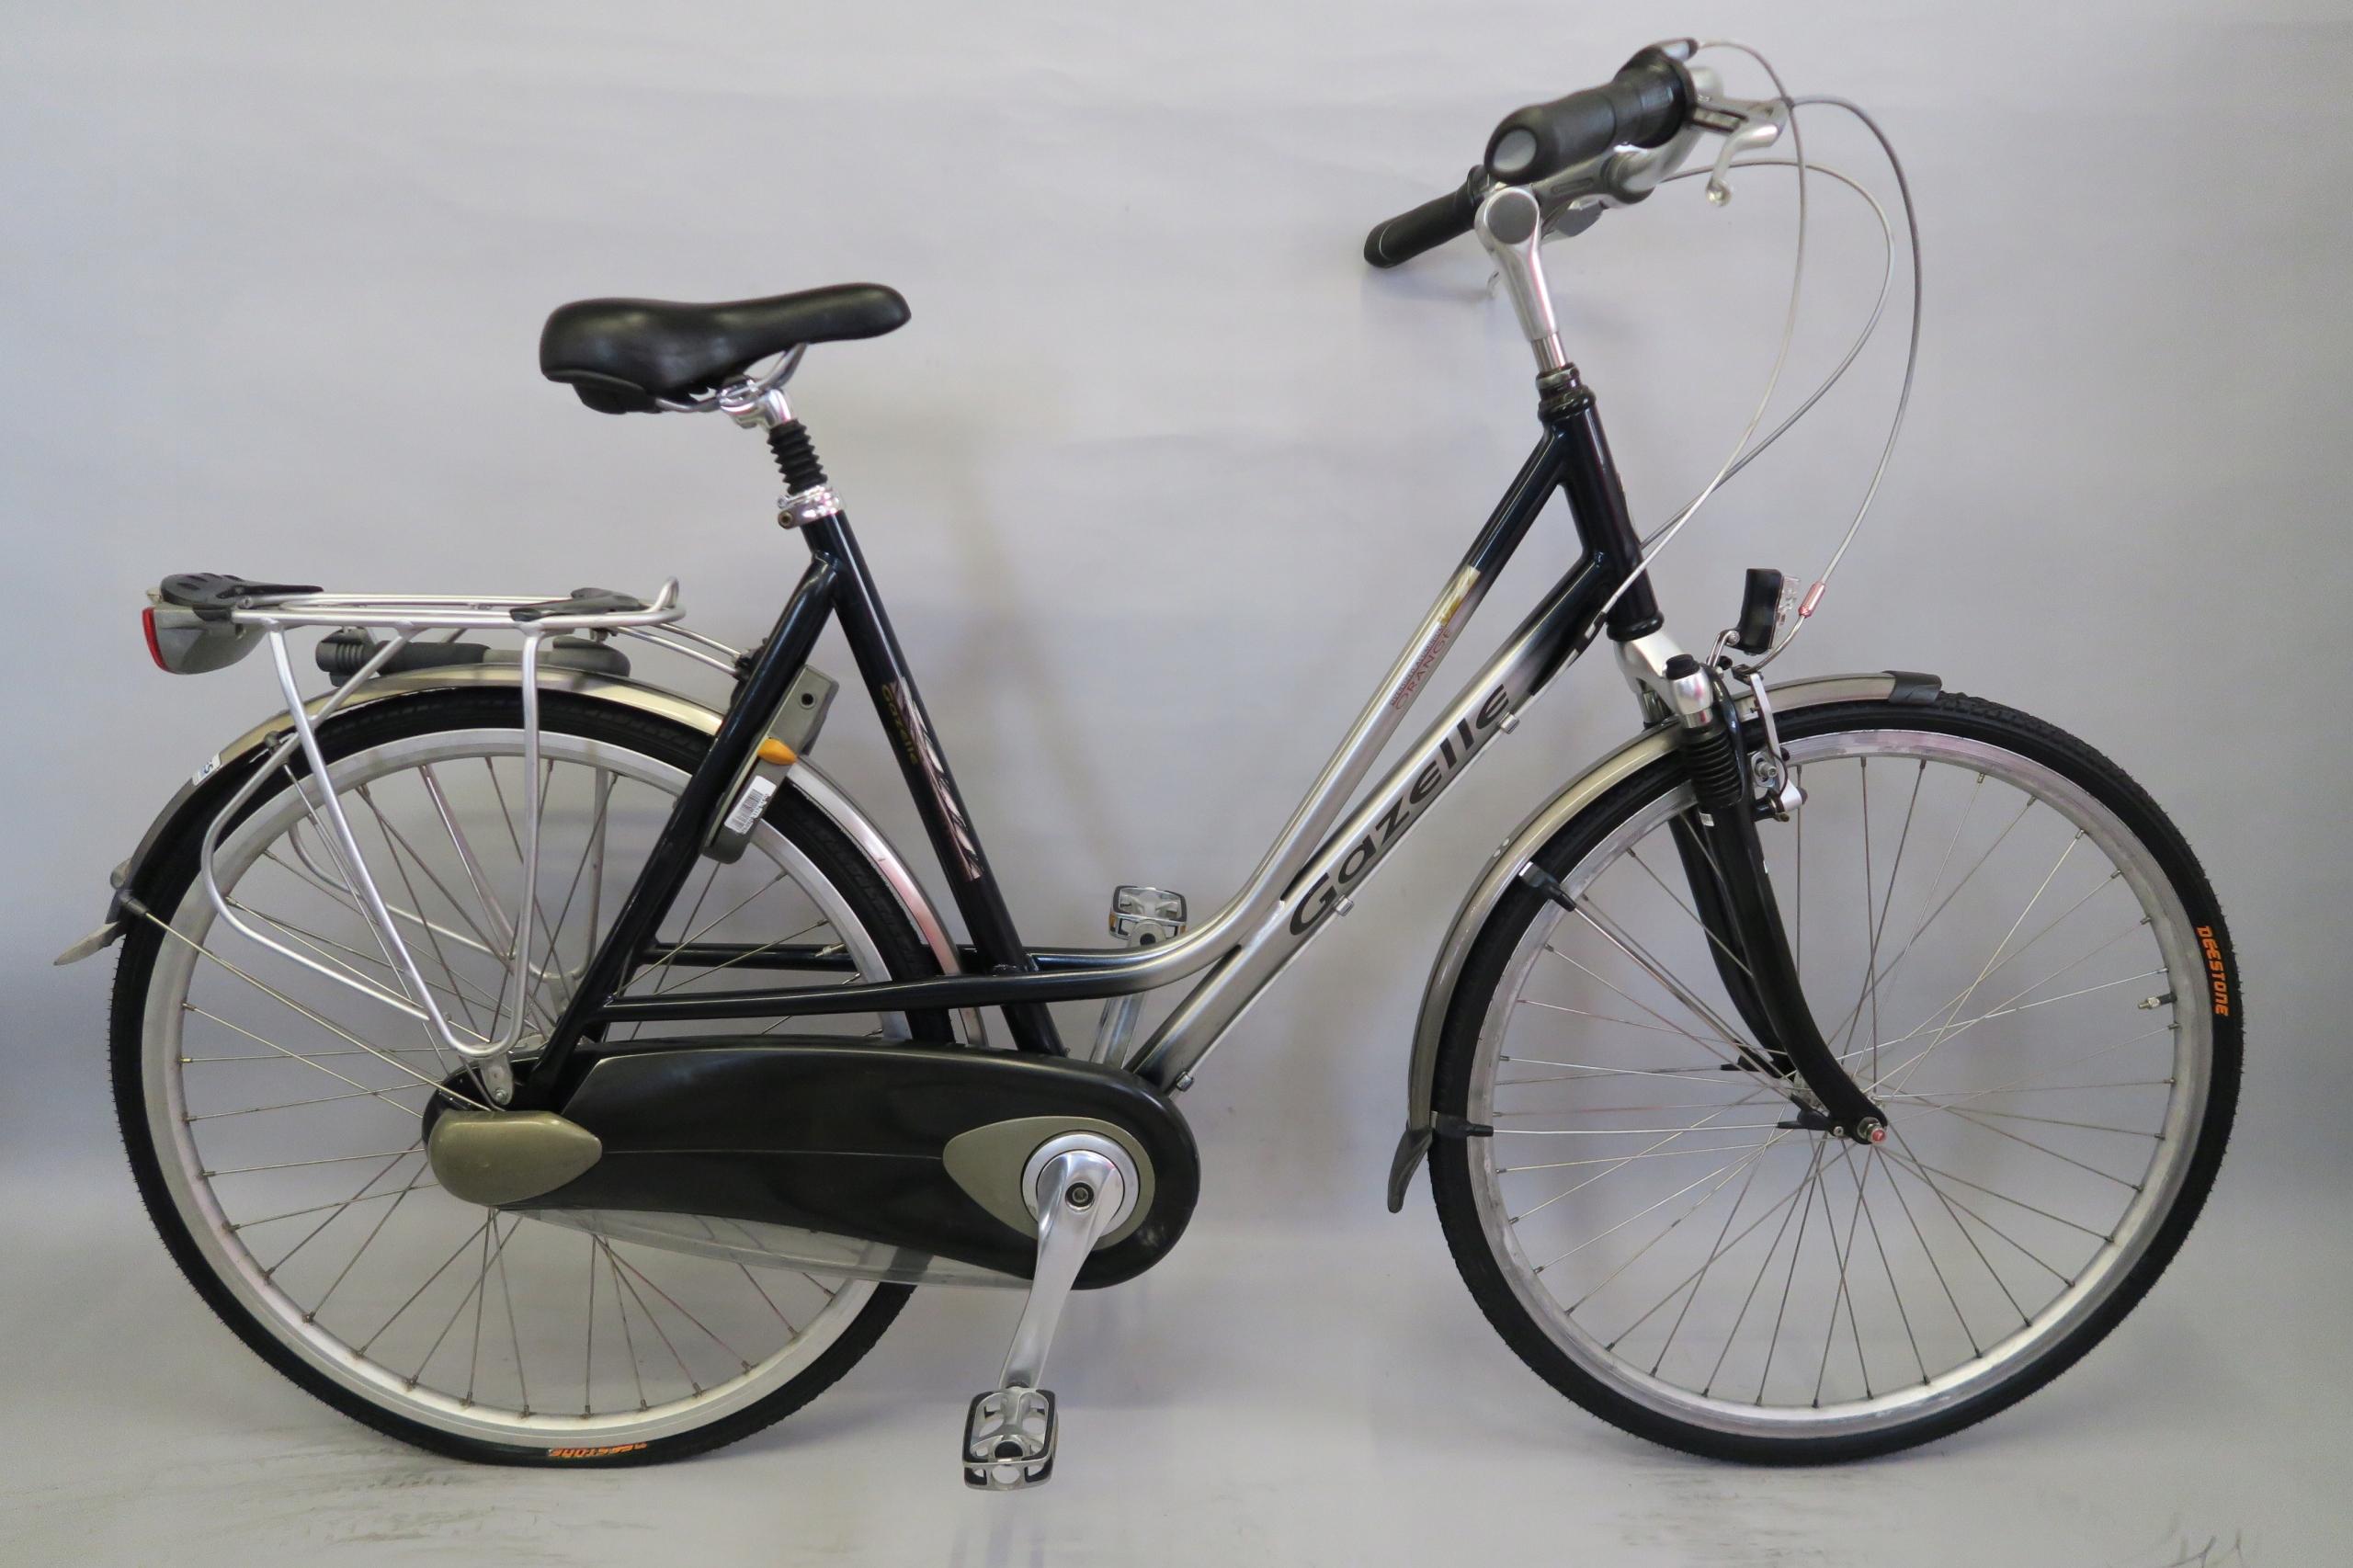 Markowy rower holenderski Gazelle Orange Nexus